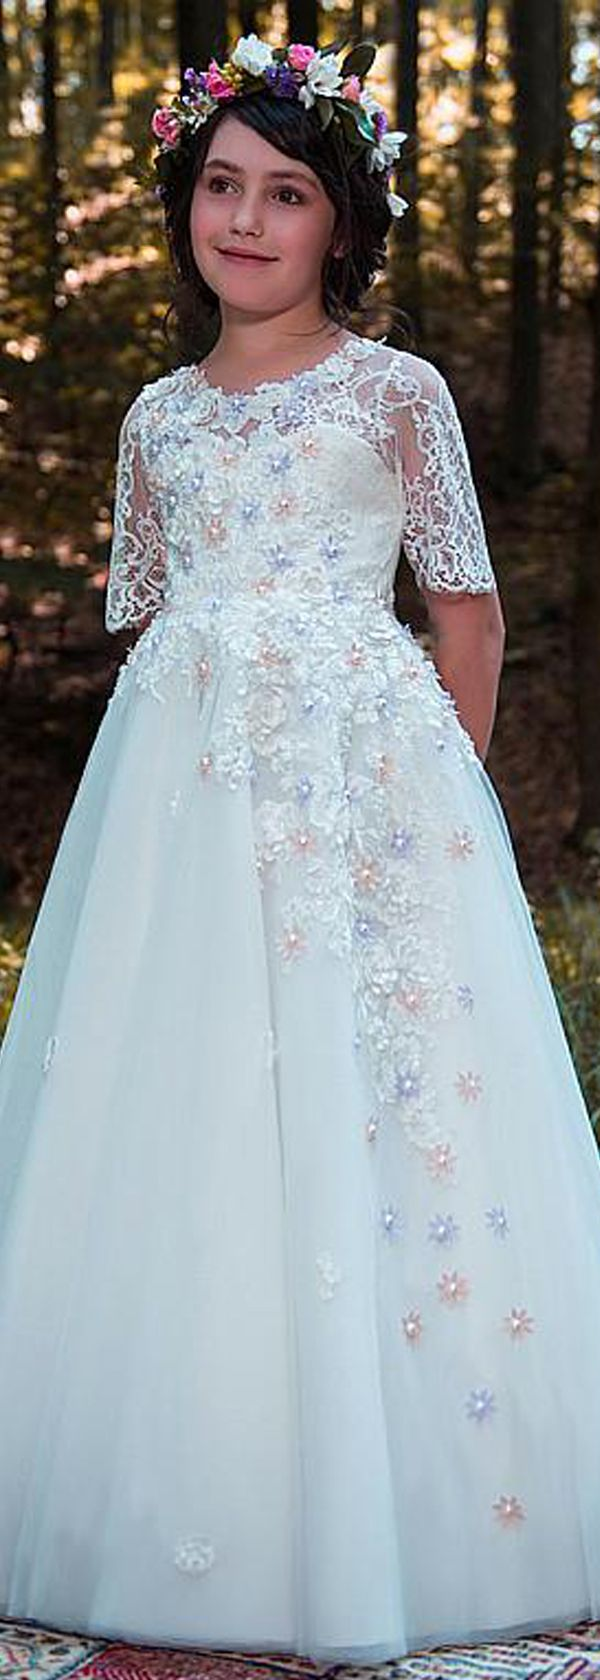 28 best 3D tulle lace girls dresses images on Pinterest | Dresses ...